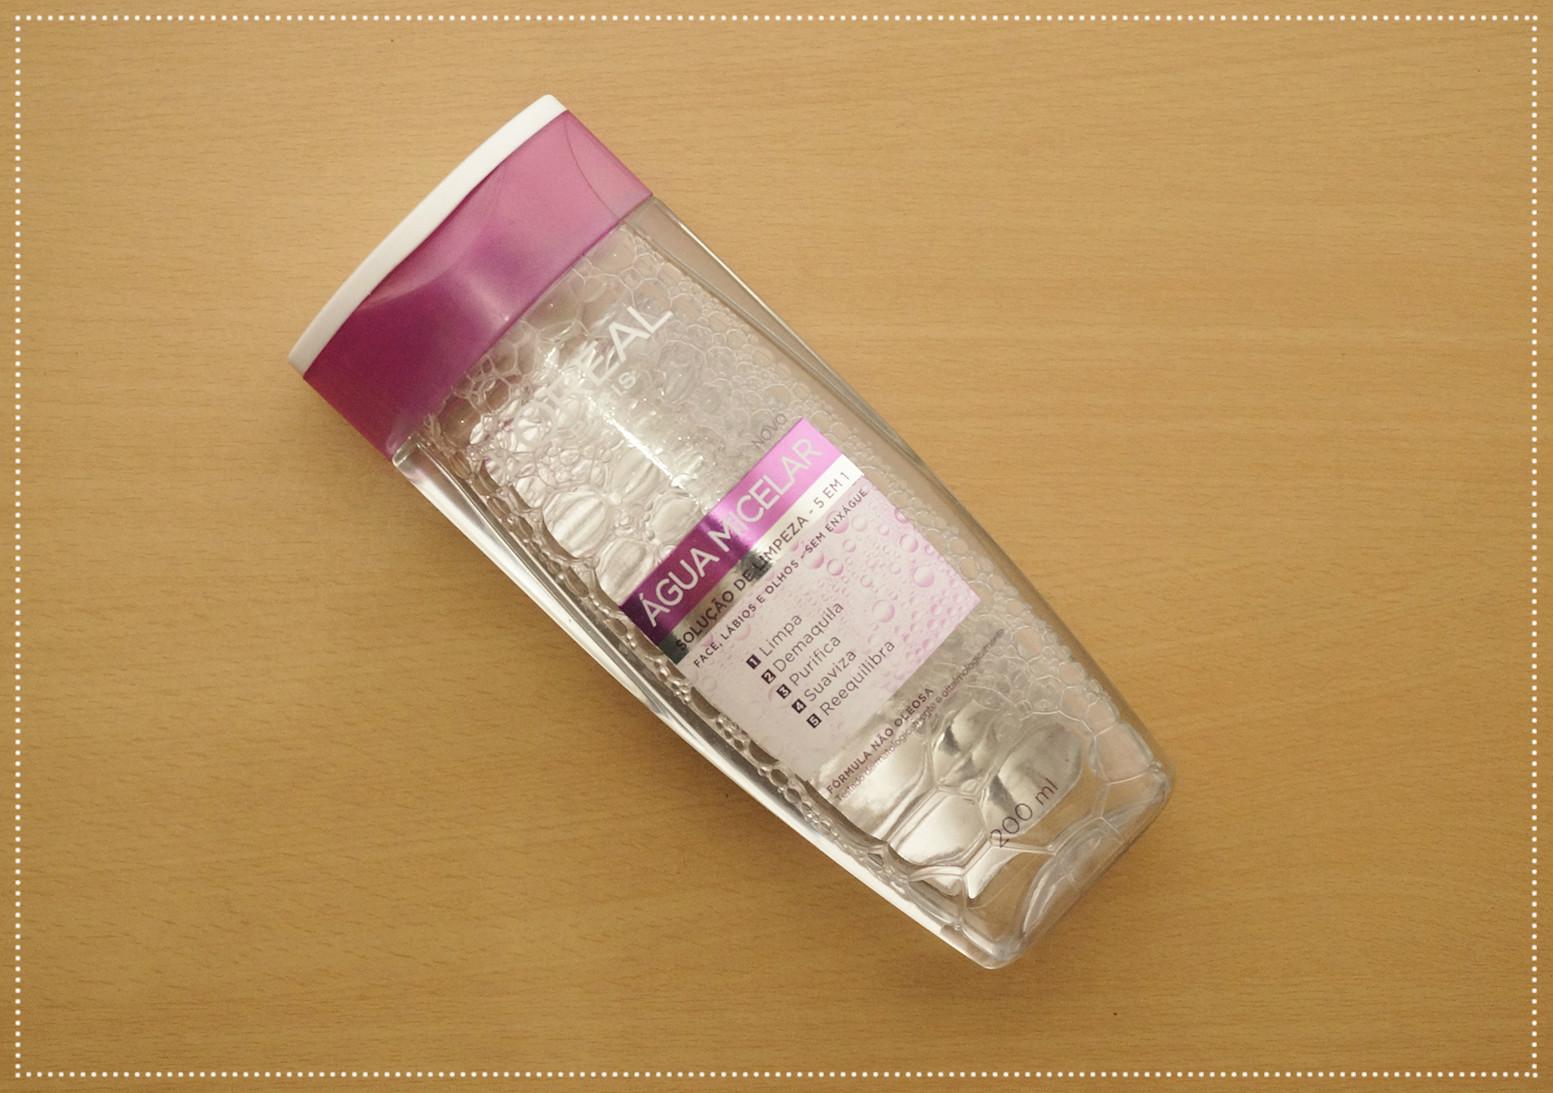 água micelar L'Oréal,água micelar L'Oréal, demaquilante loreal, loreal, produtos loreal, água loreal, loção loreal